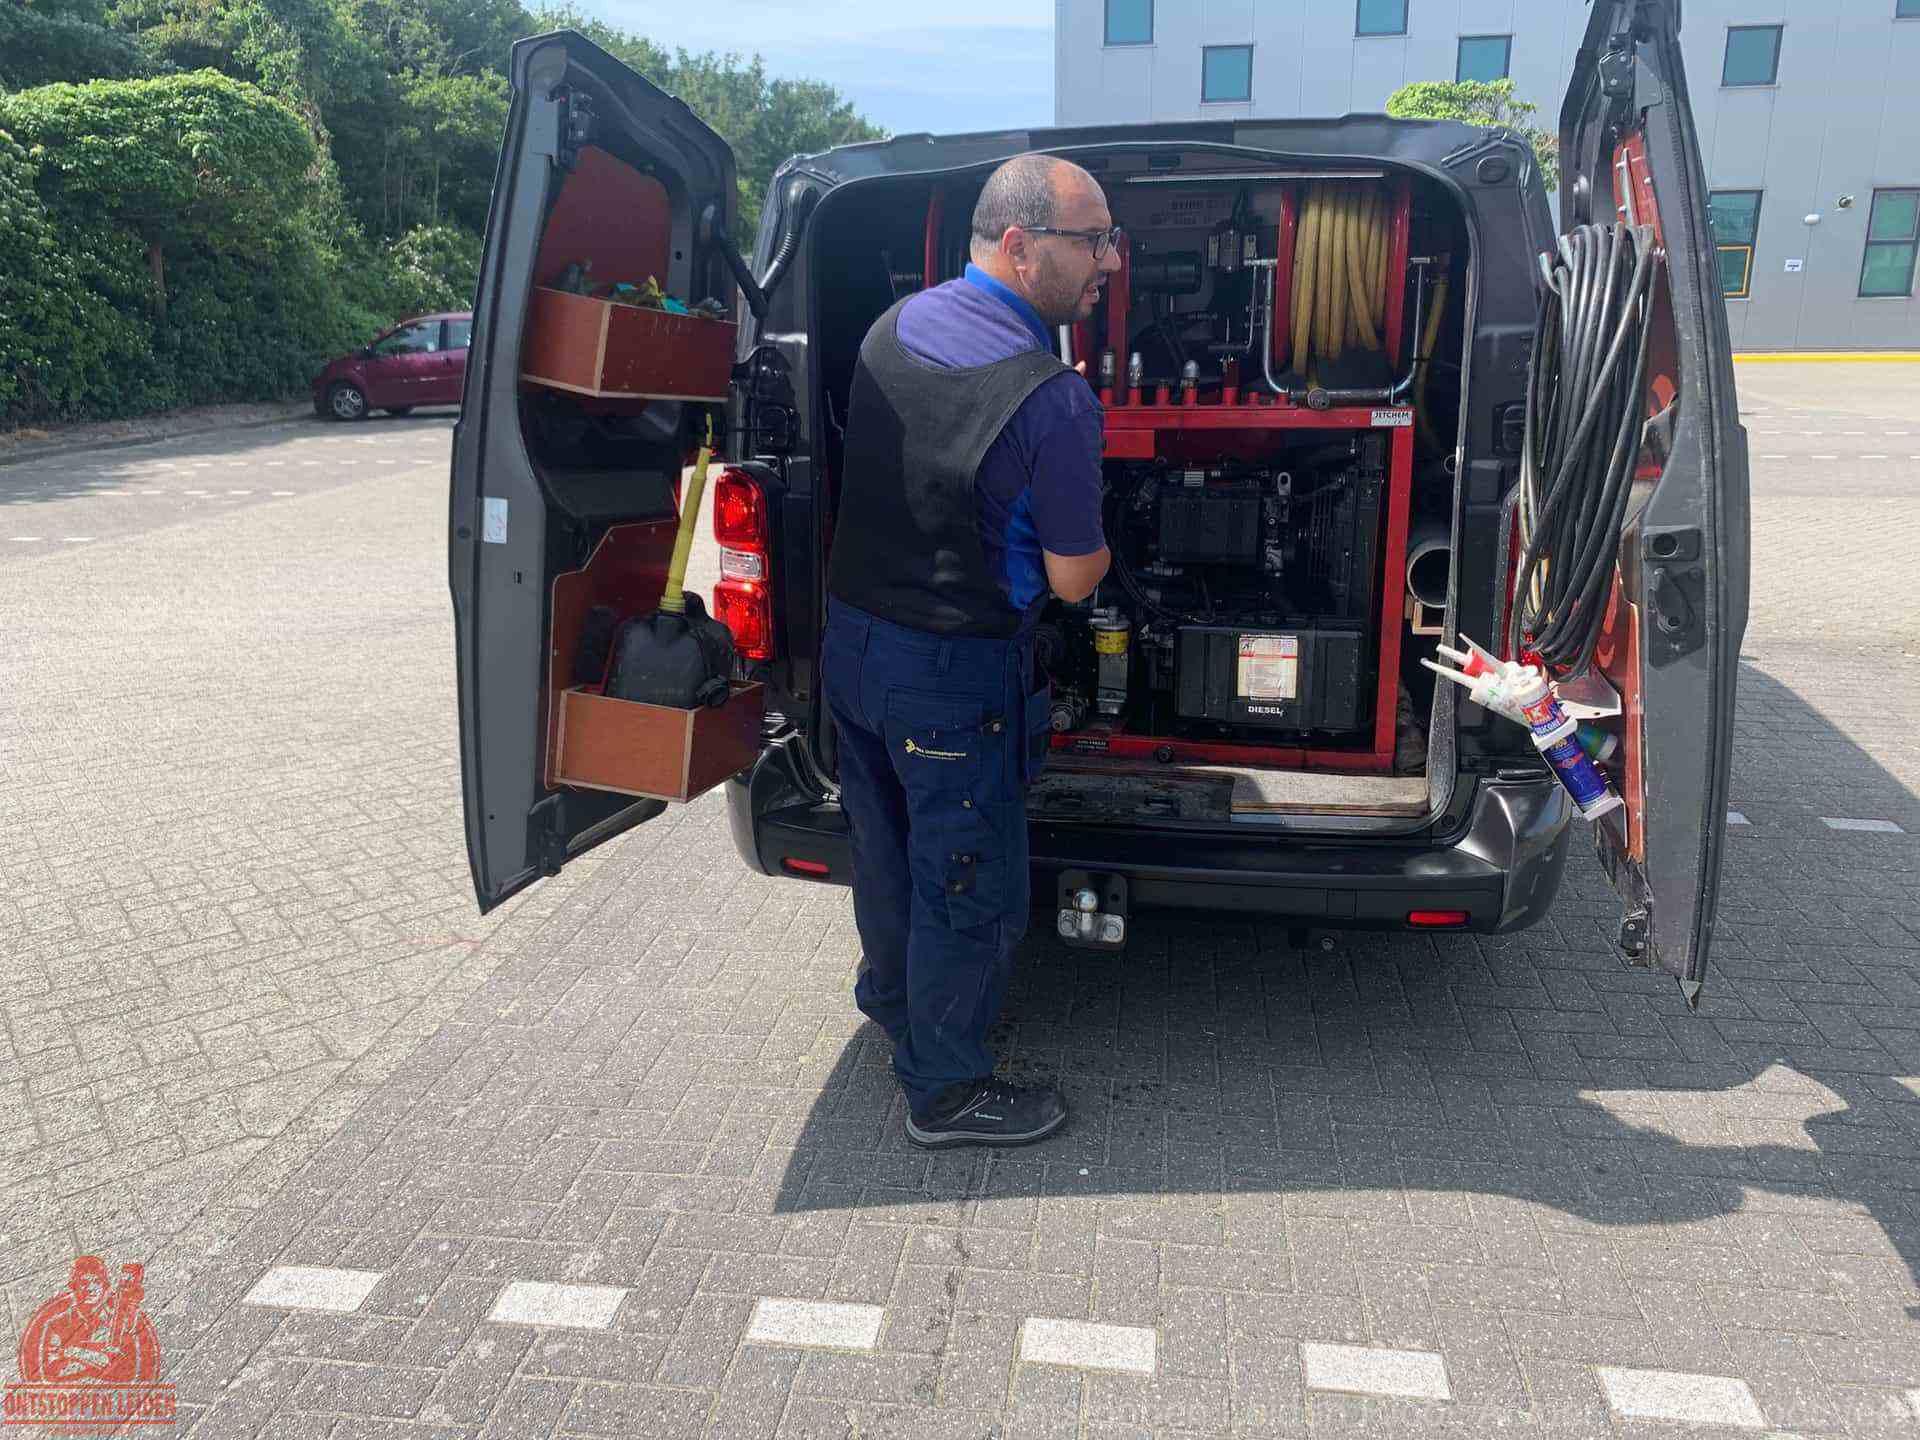 Loodgieter Leiden Ontstopping